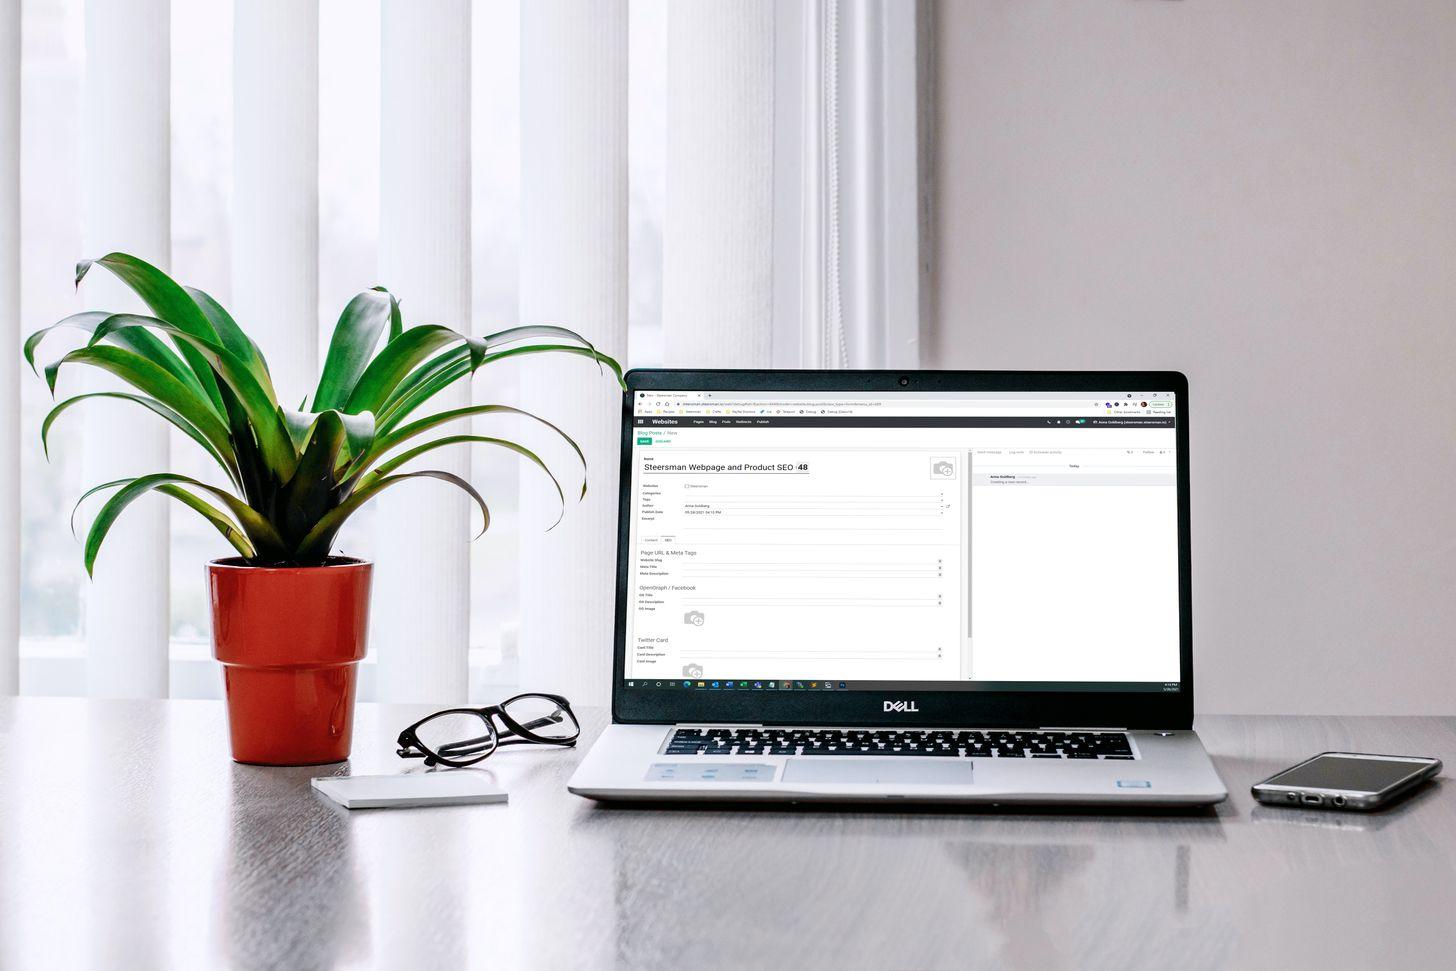 web and product seo.jpg